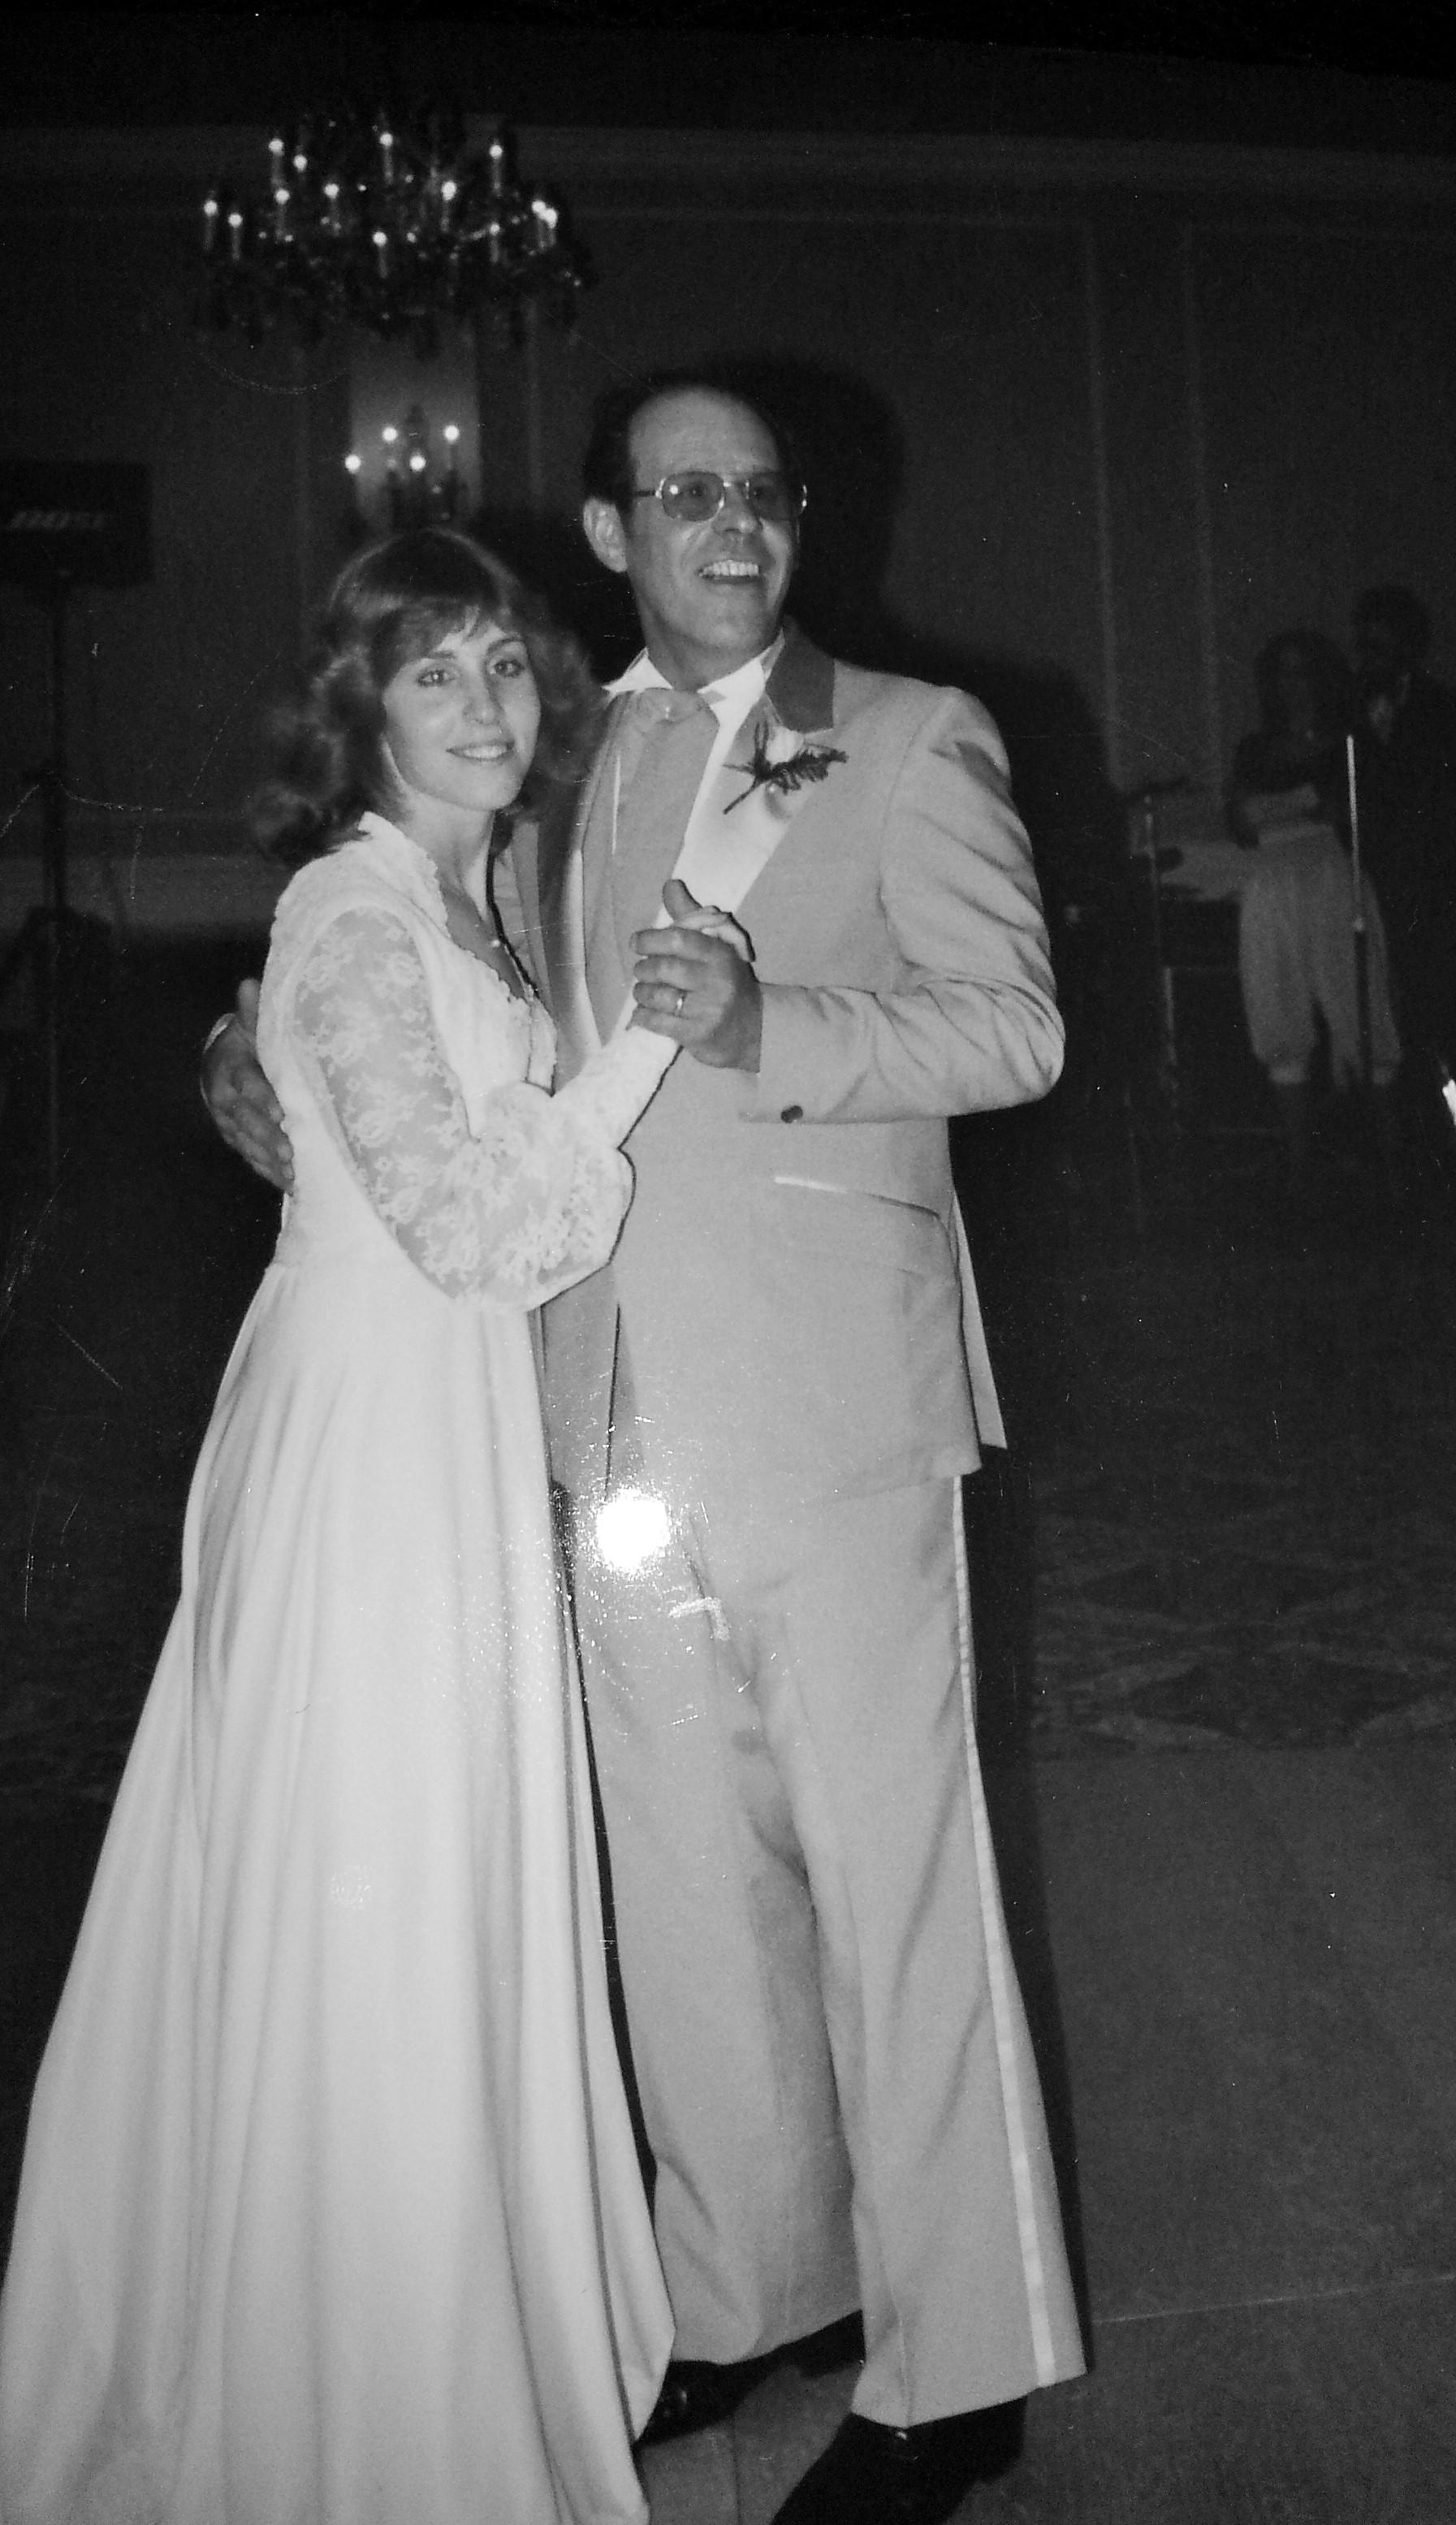 Dad and I at my wedding (2)